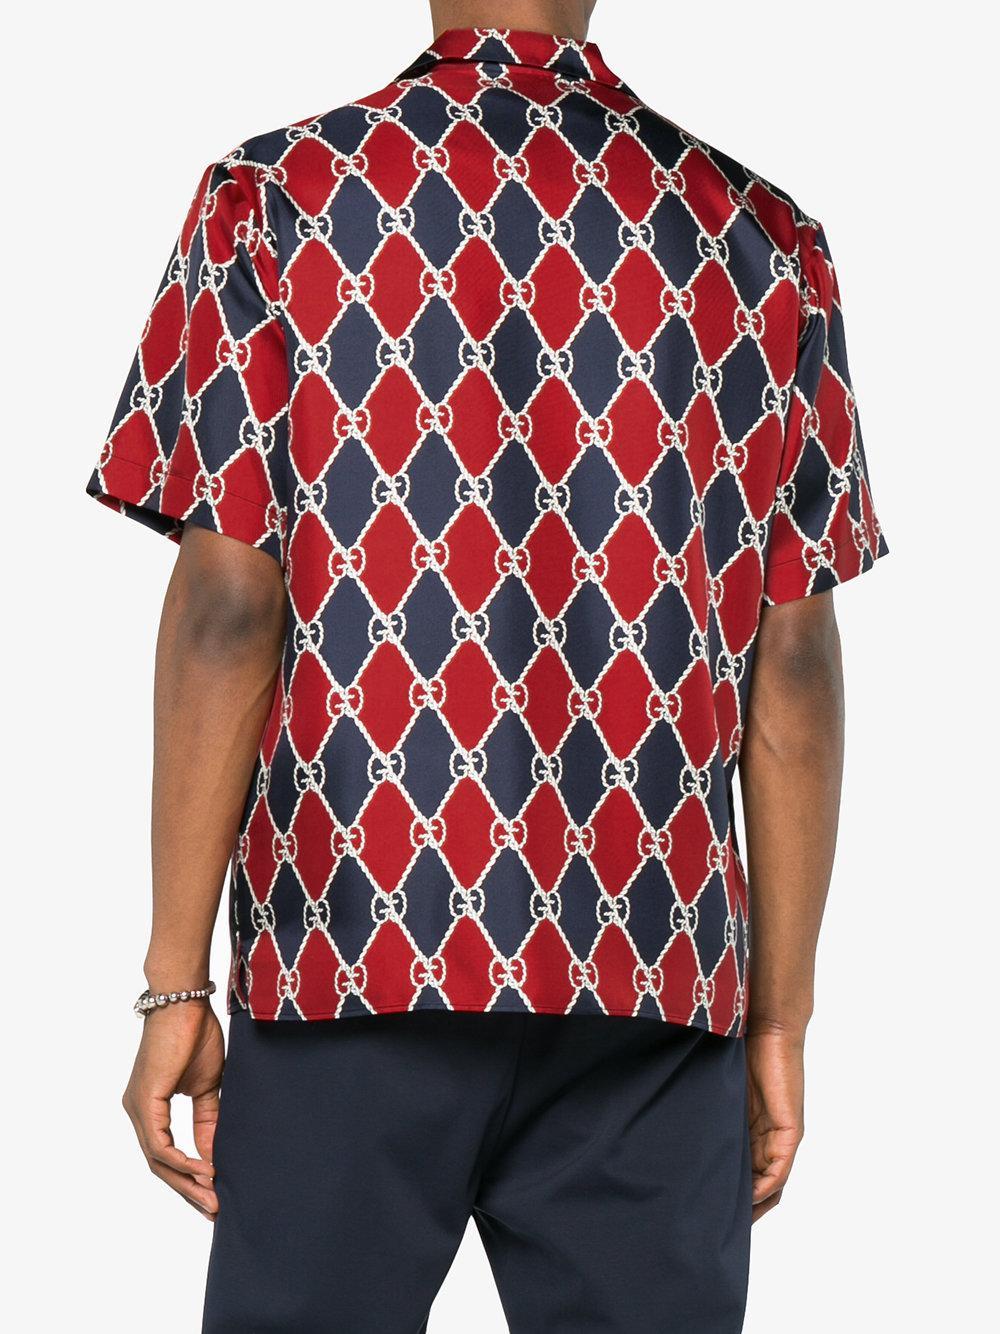 c667cab3 Bowling Shirts Personalised Uk